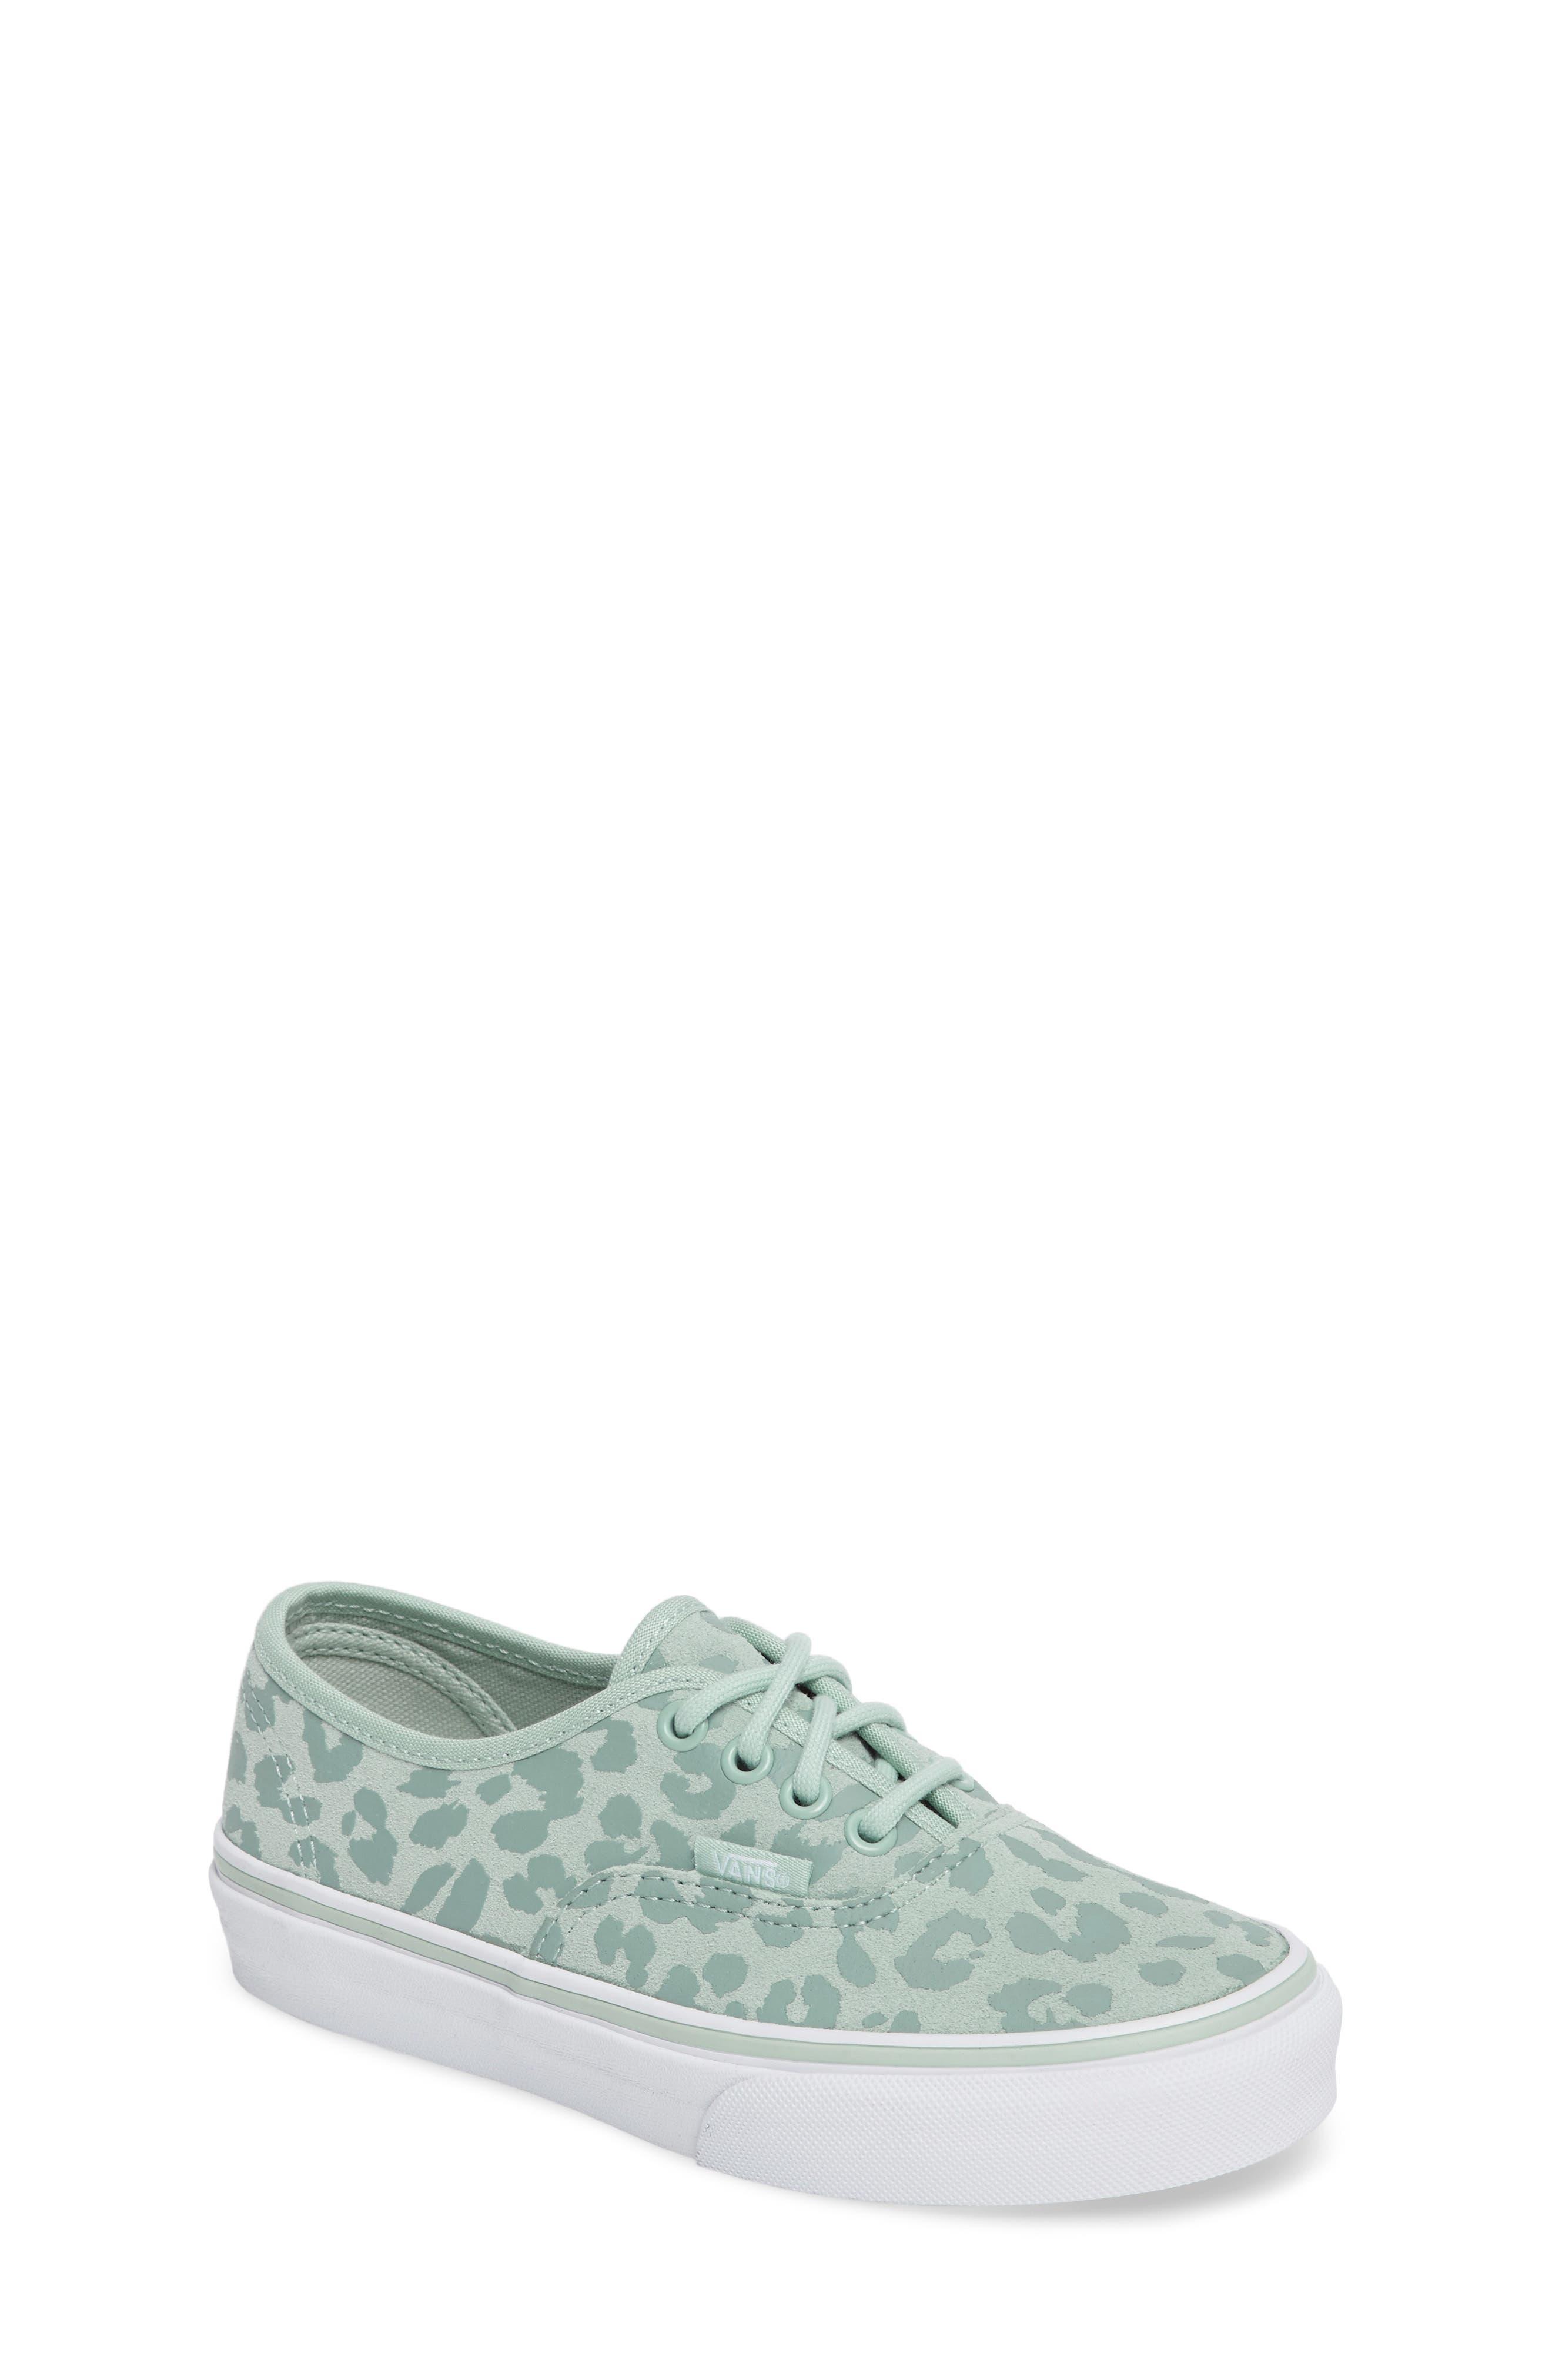 Vans Authentic Leopard Print Sneaker (Toddler, Little Kid & Big Kid)